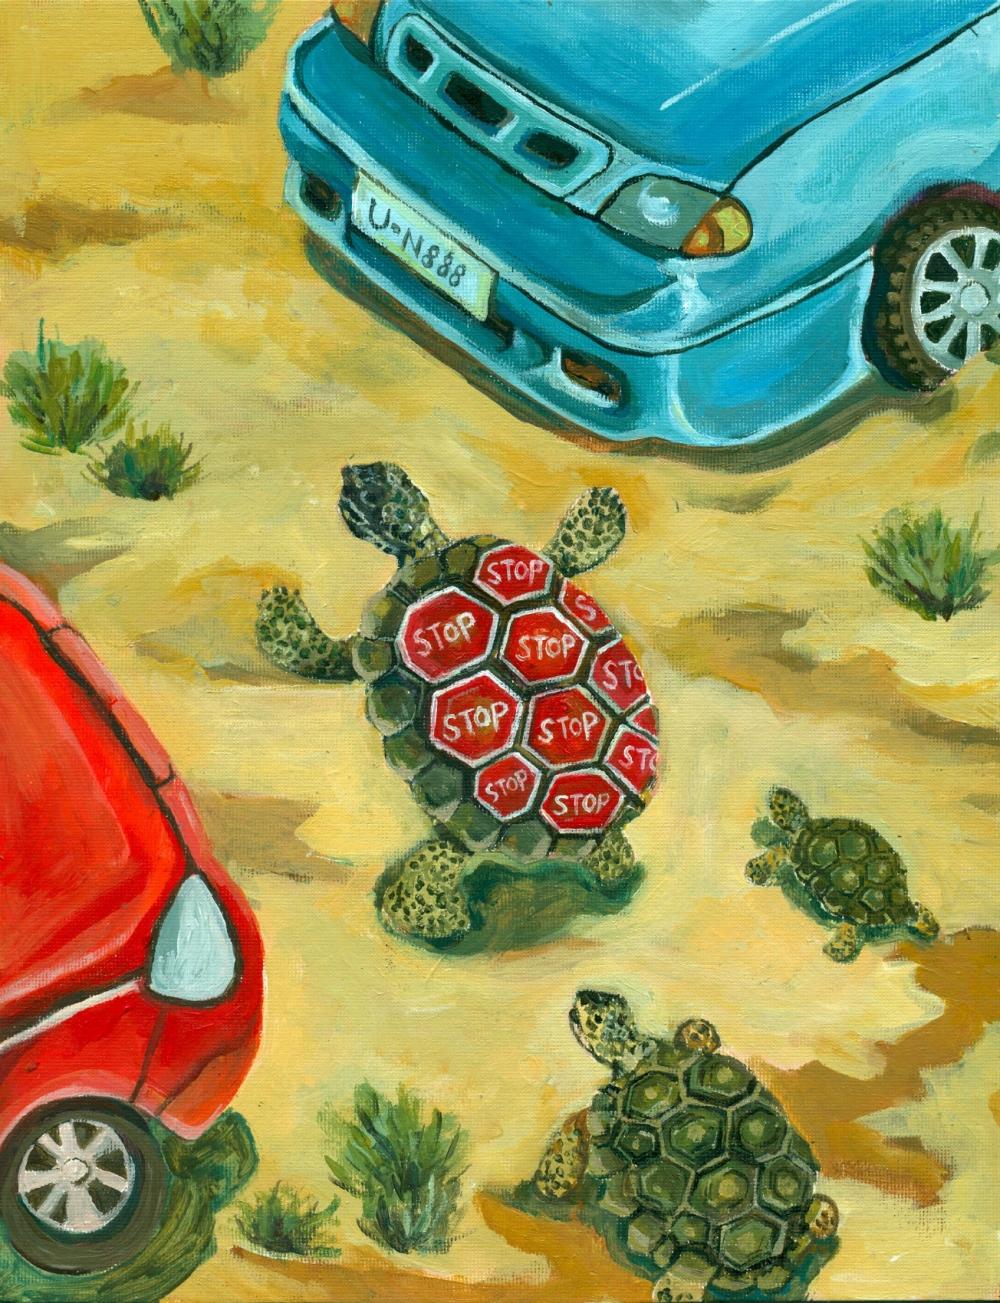 Sonya Cao - desert traffic